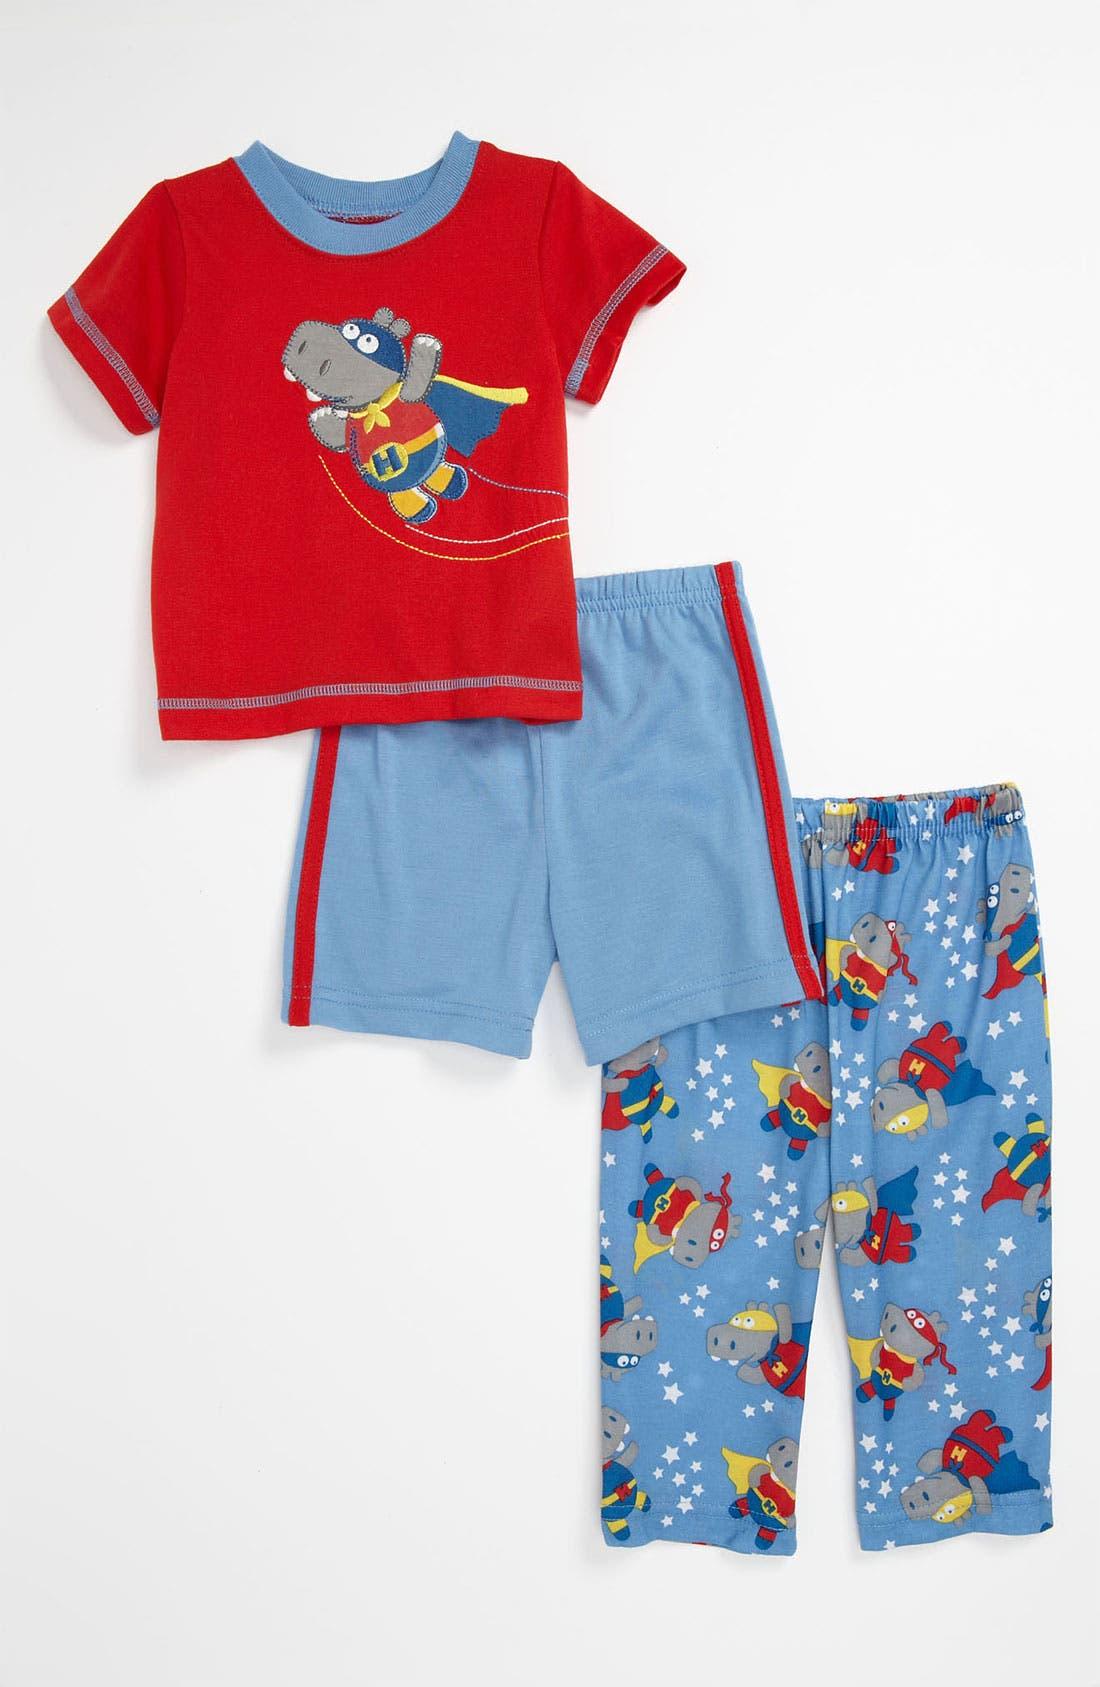 Alternate Image 1 Selected - Little Me 'Hippo' Sleepwear Set (Toddler)